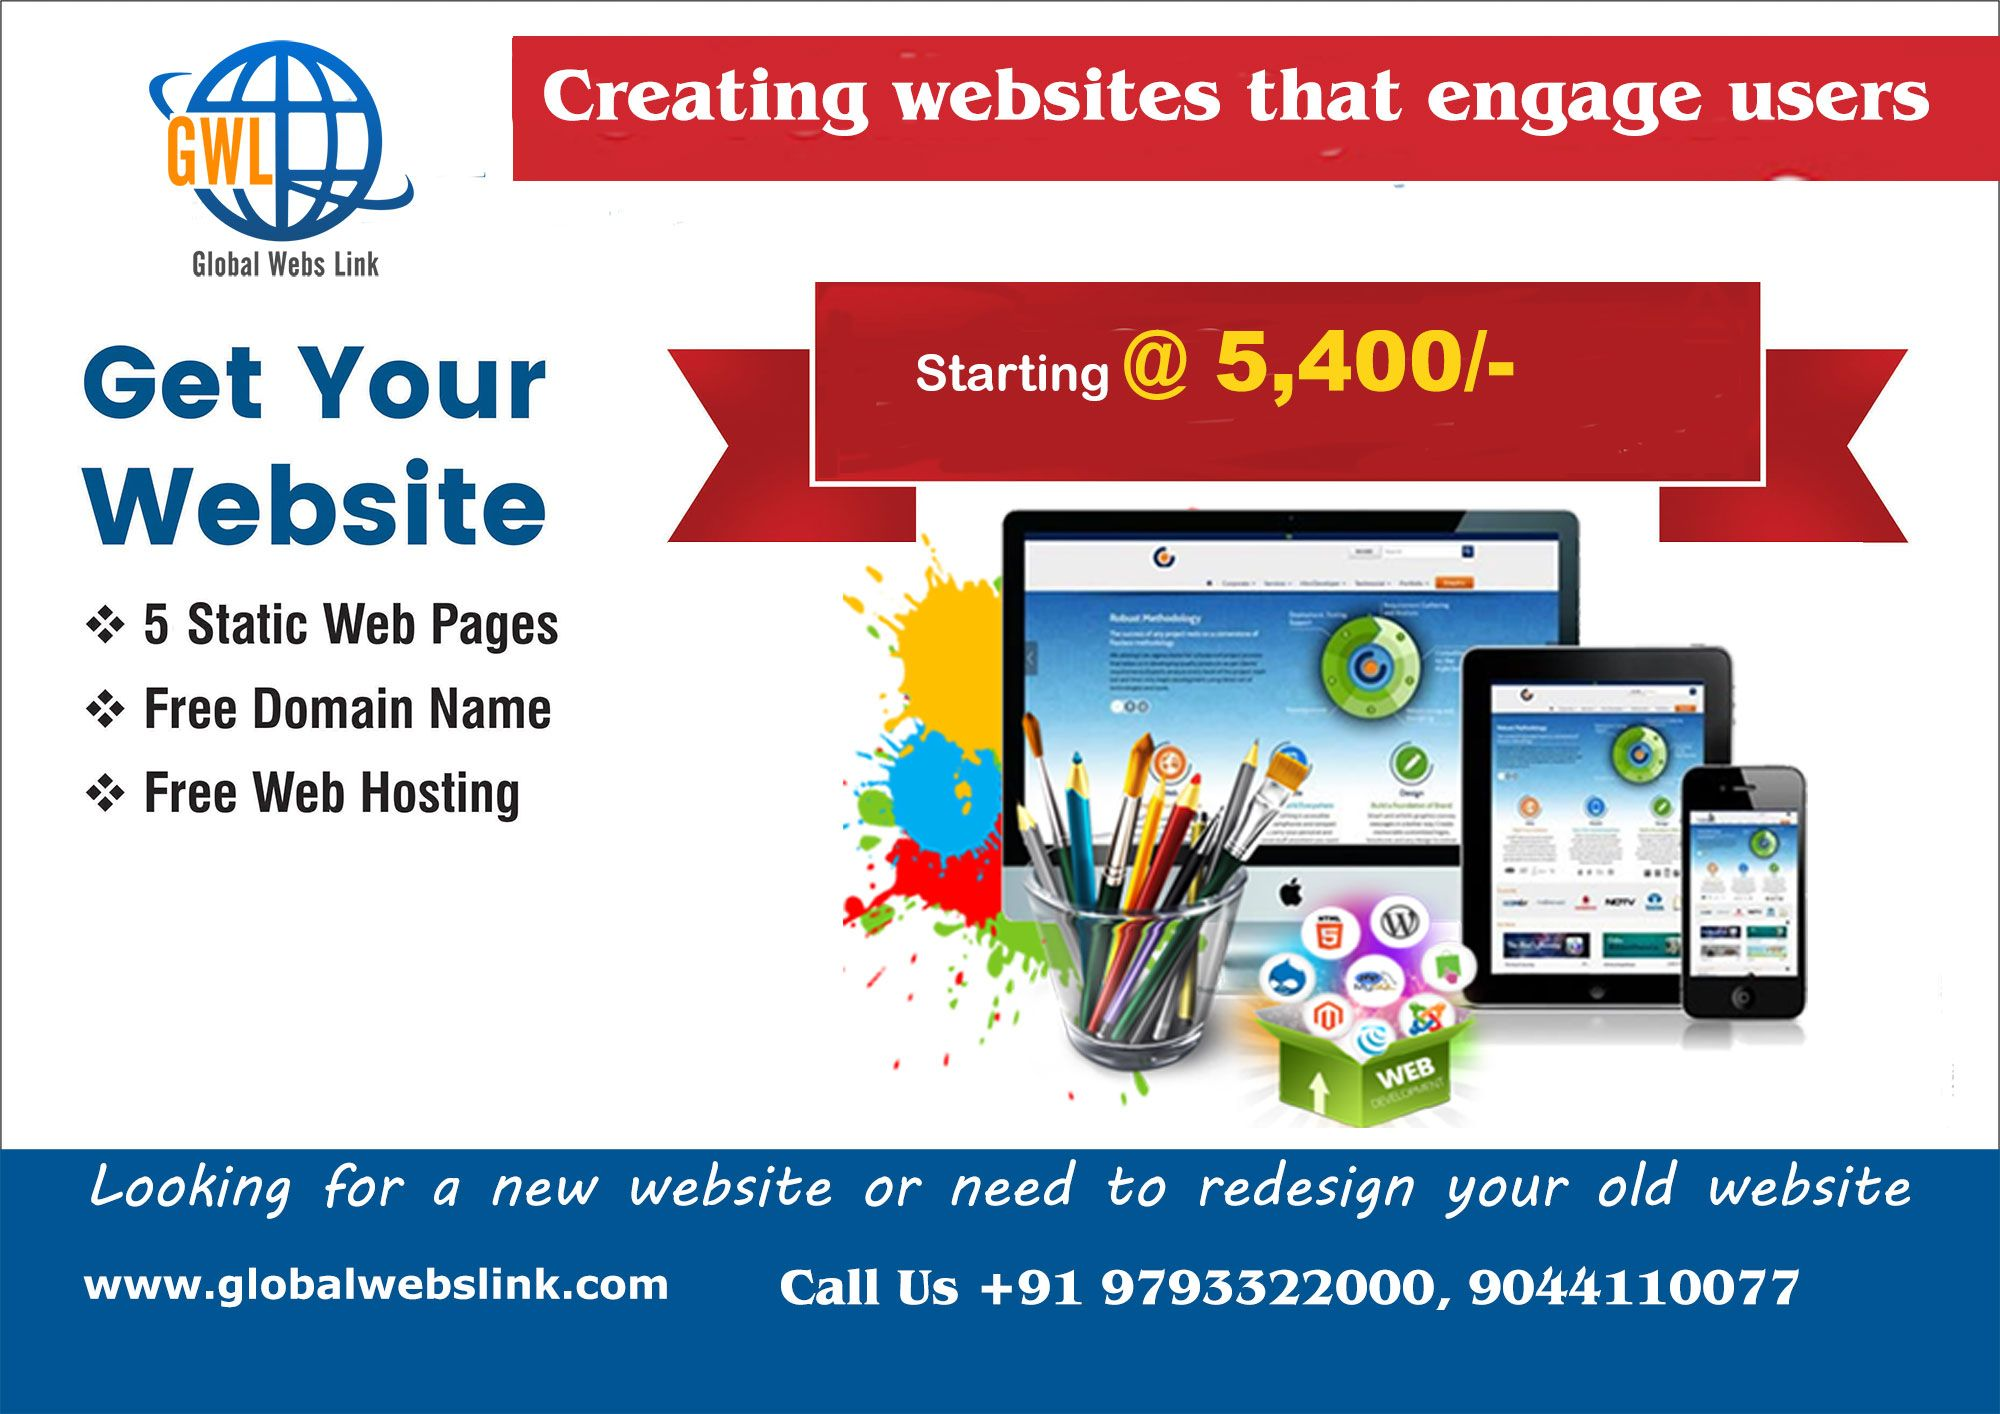 Digital Marketing In Lucknow Website Designing In Lucknow It Company In Lucknow Website Design Software Website Design Courses Website Design Tutorial